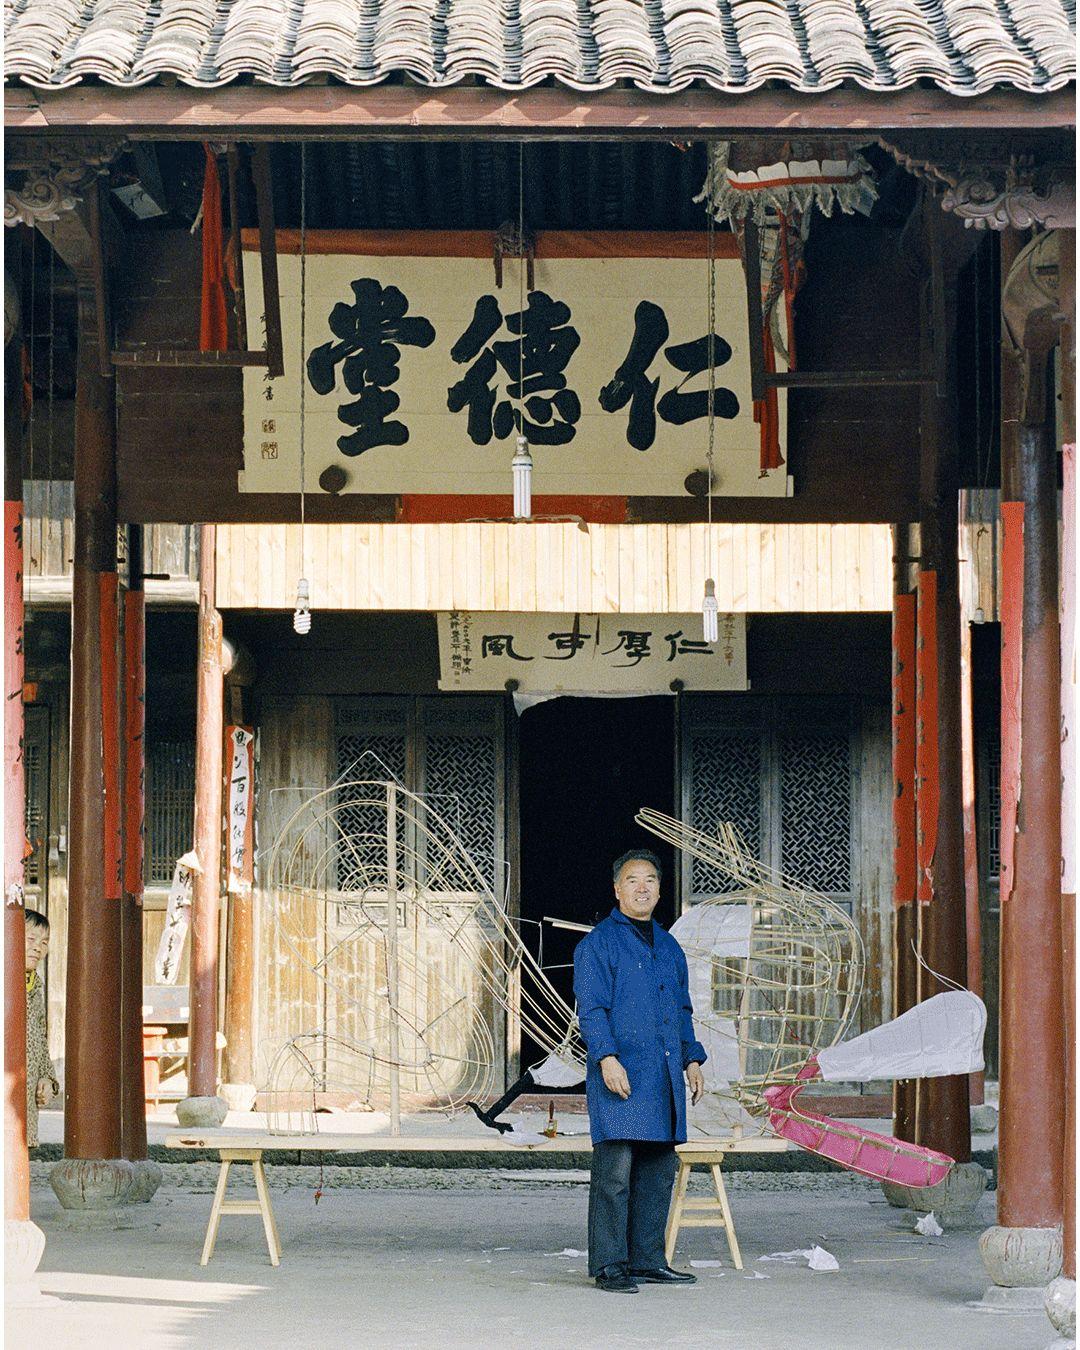 LOEWE罗意威新春短片:用传统工艺书写庚子中国年